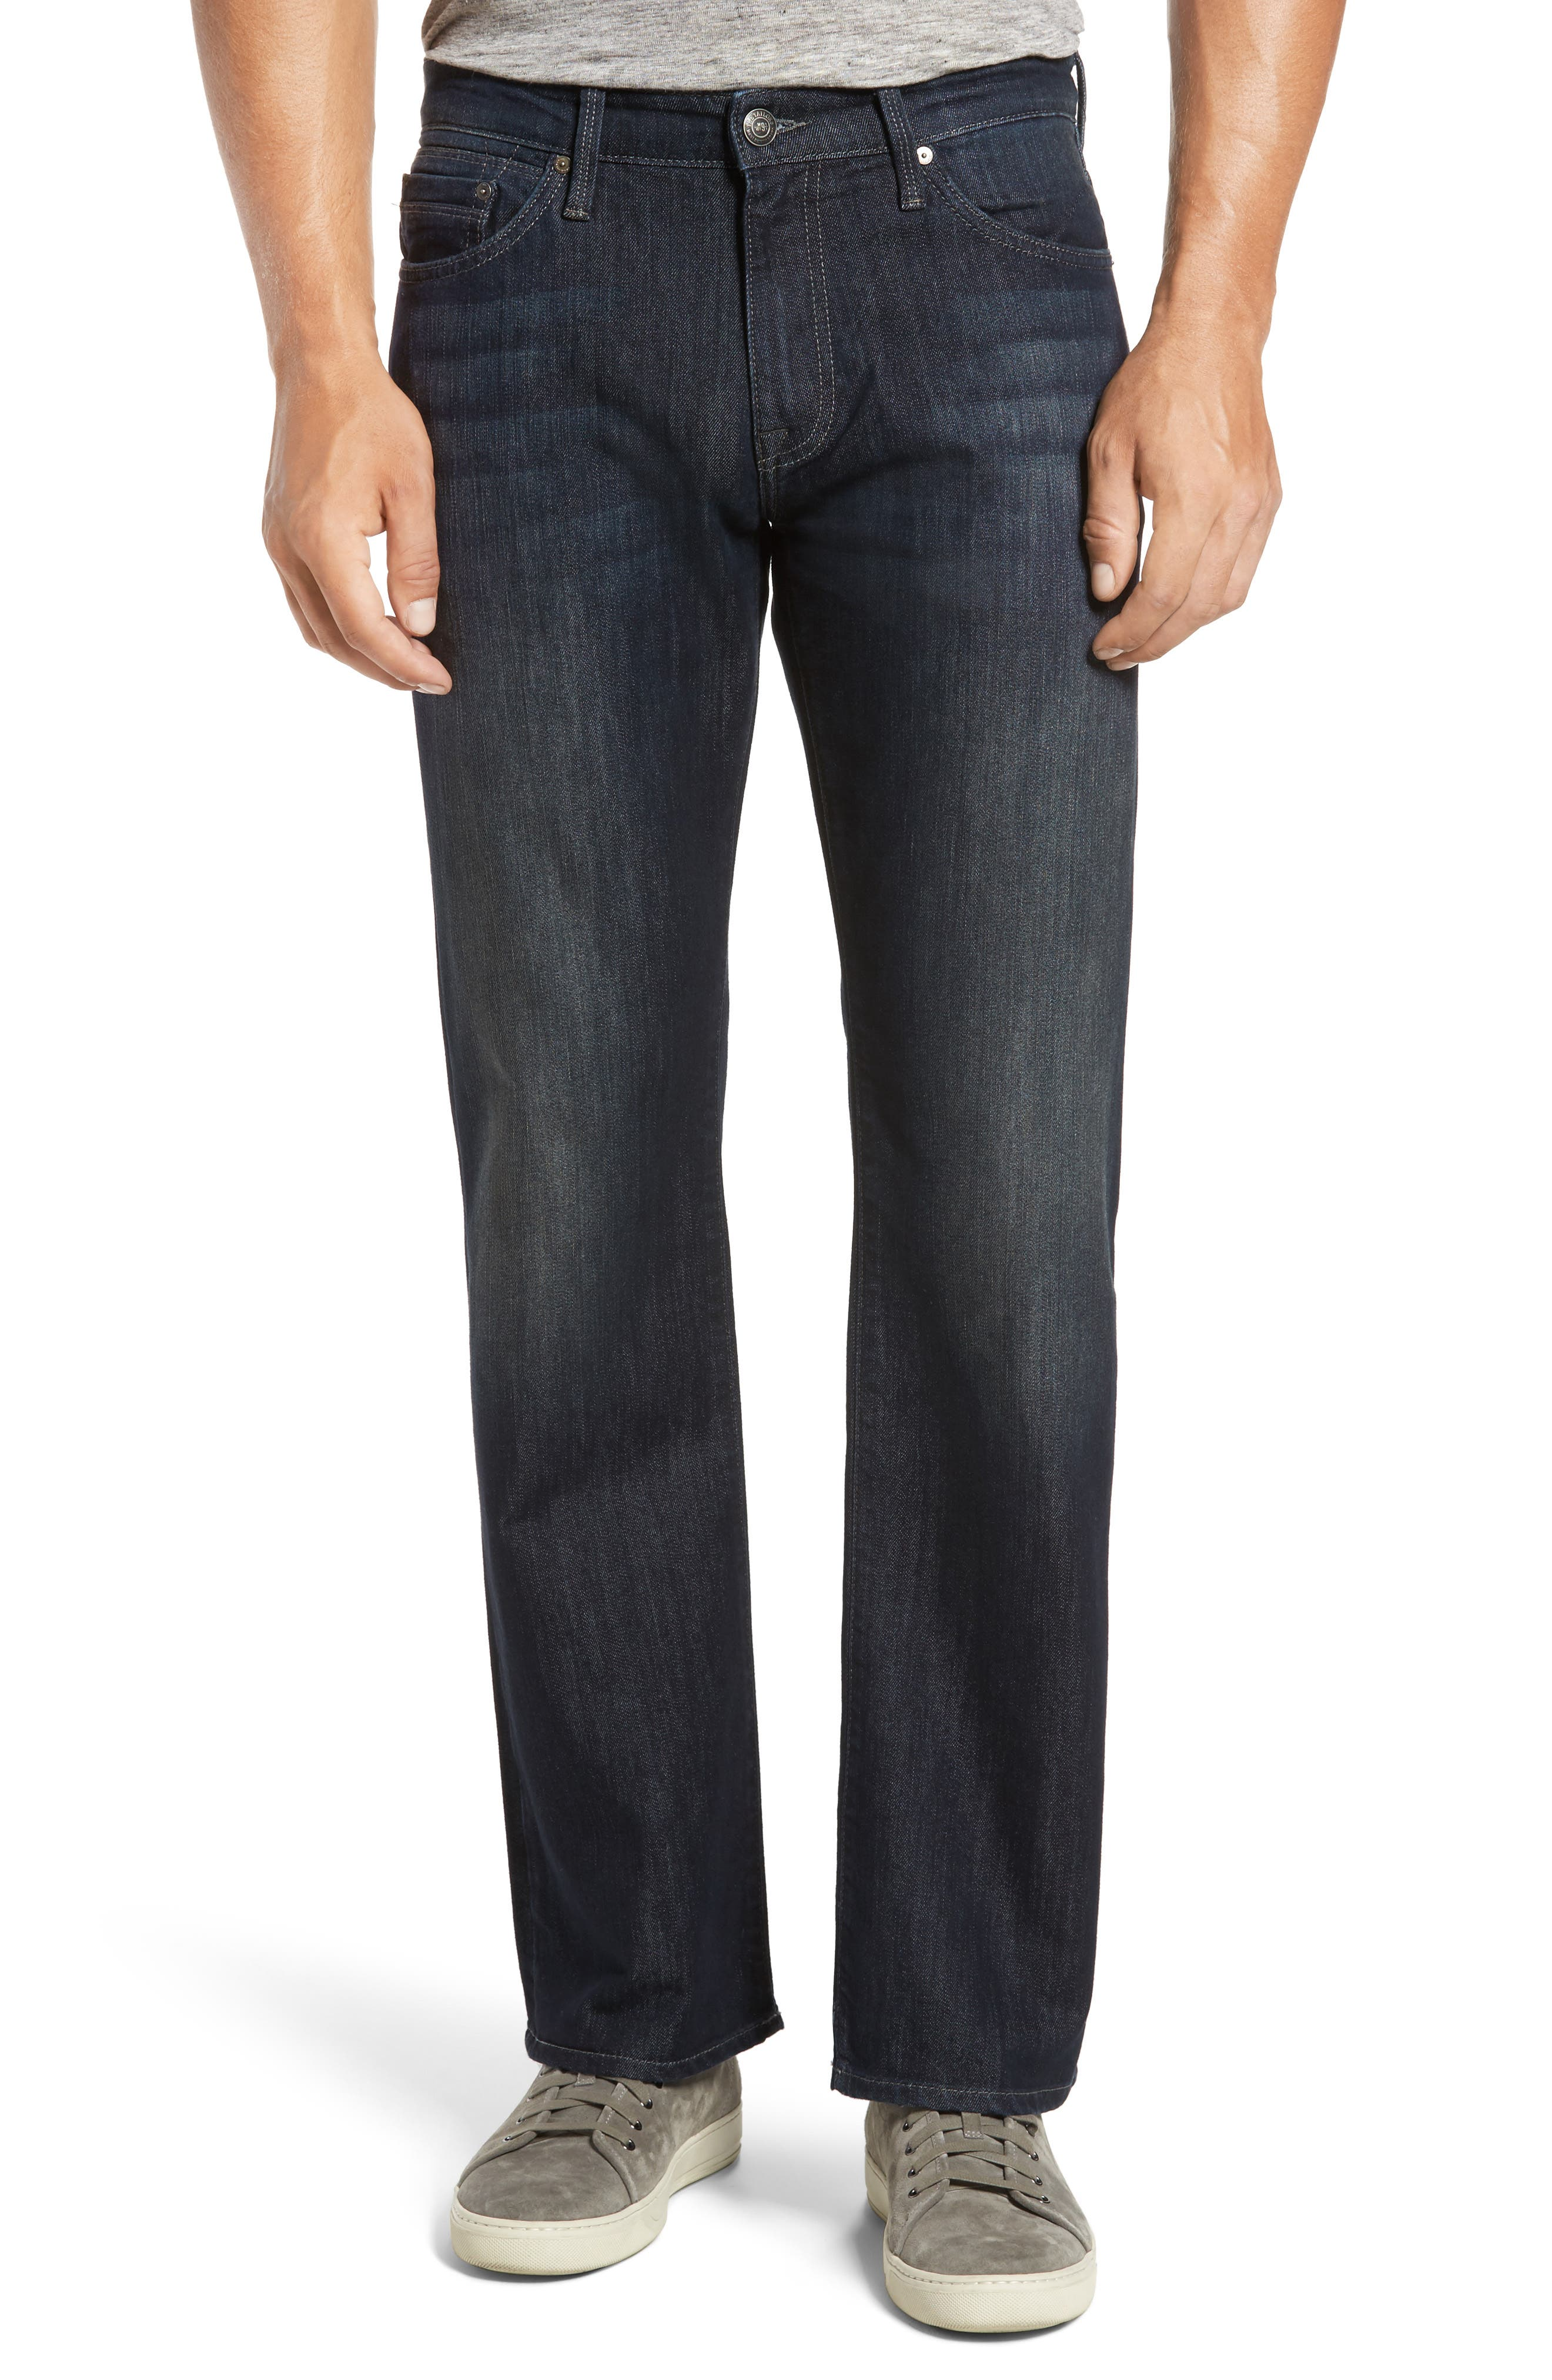 Alternate Image 1 Selected - Mavi Jeans Josh Bootcut Jeans (Deep Stanford)